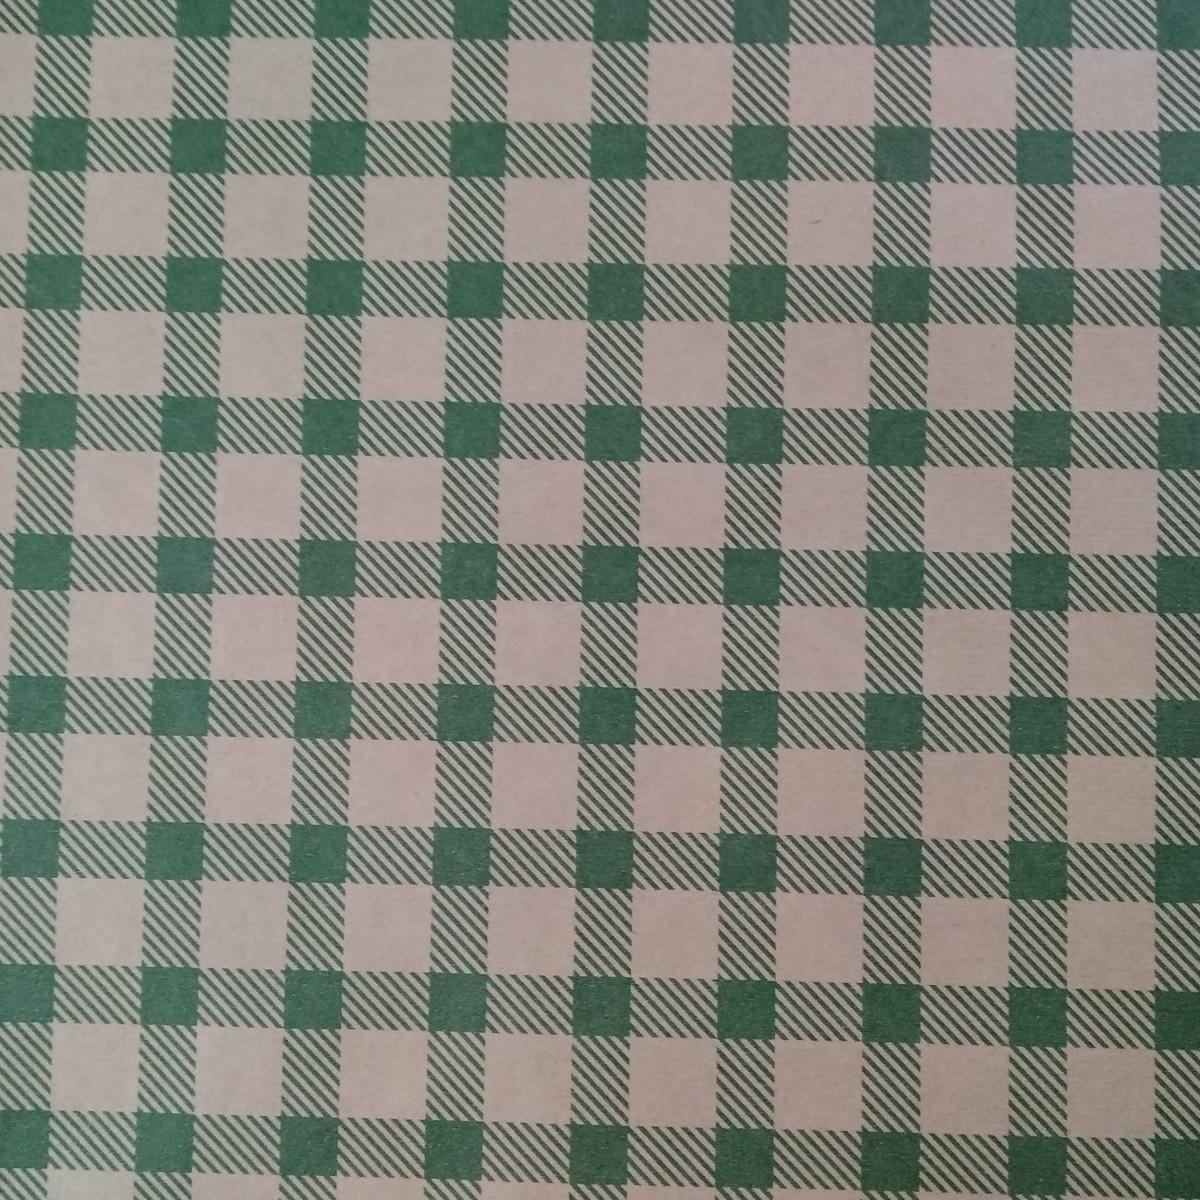 7215 Chex Print Dark Green 50cmx25m Kraft Paper - 1 Roll